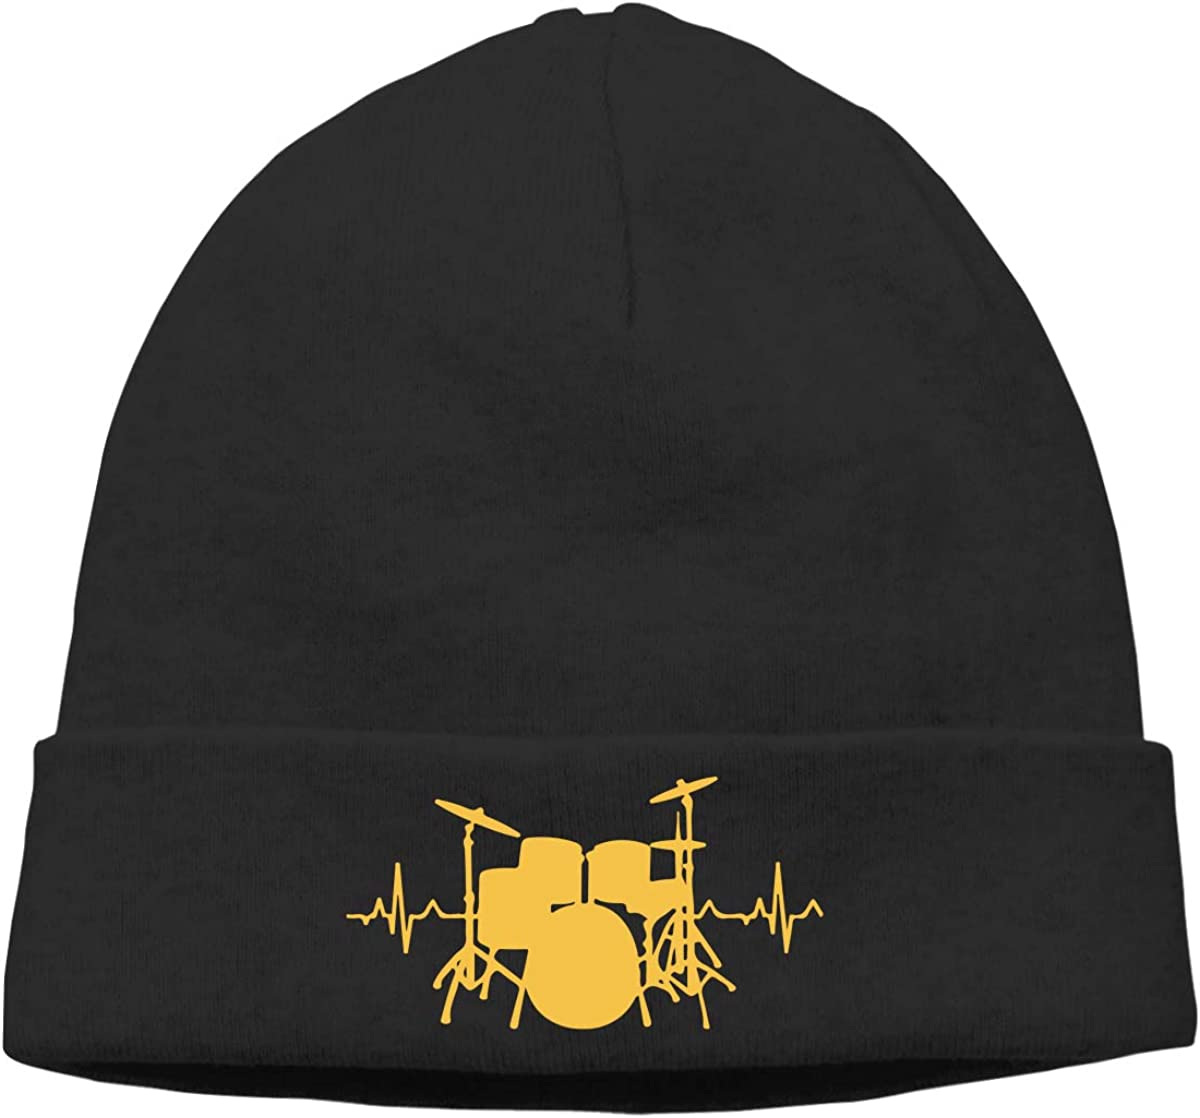 Mens/&Womens Drums Heartbeat Soft Skull Beanie Cap